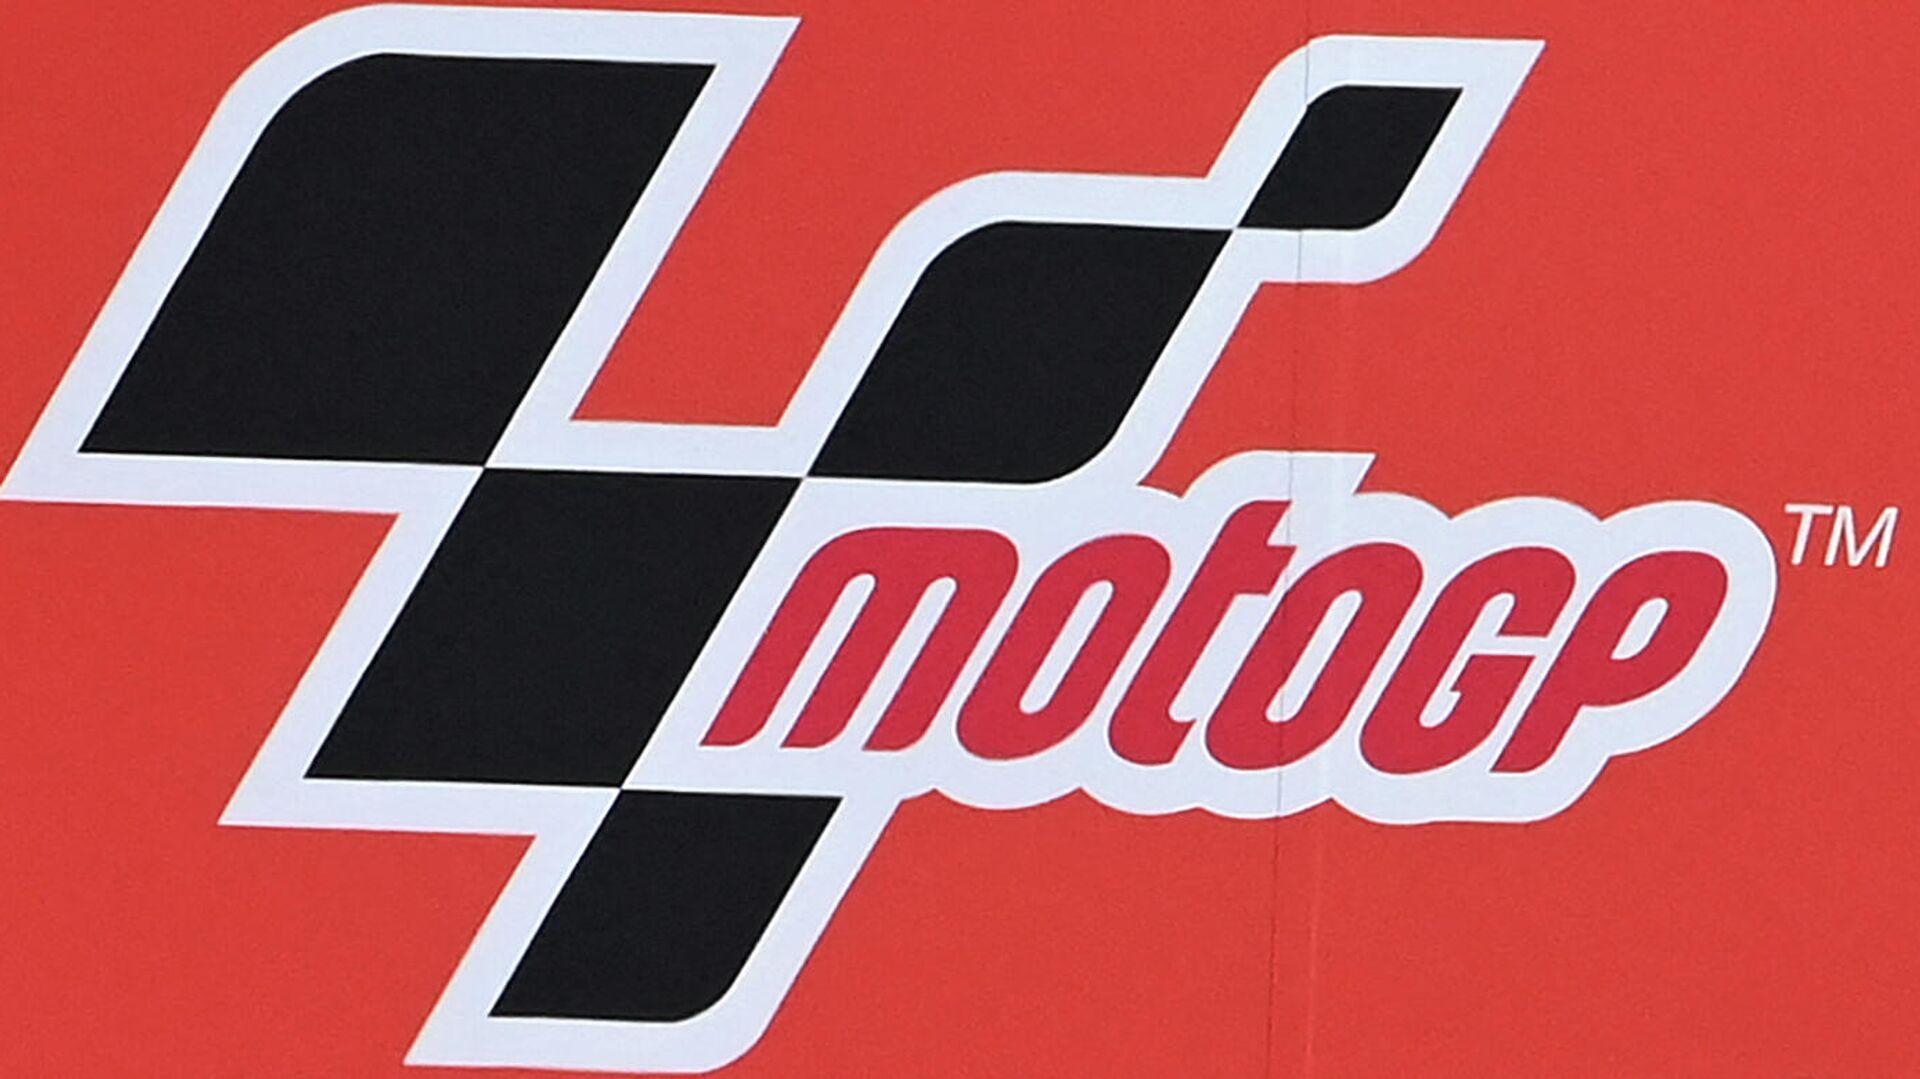 Логотип MotoGP - РИА Новости, 1920, 11.09.2021